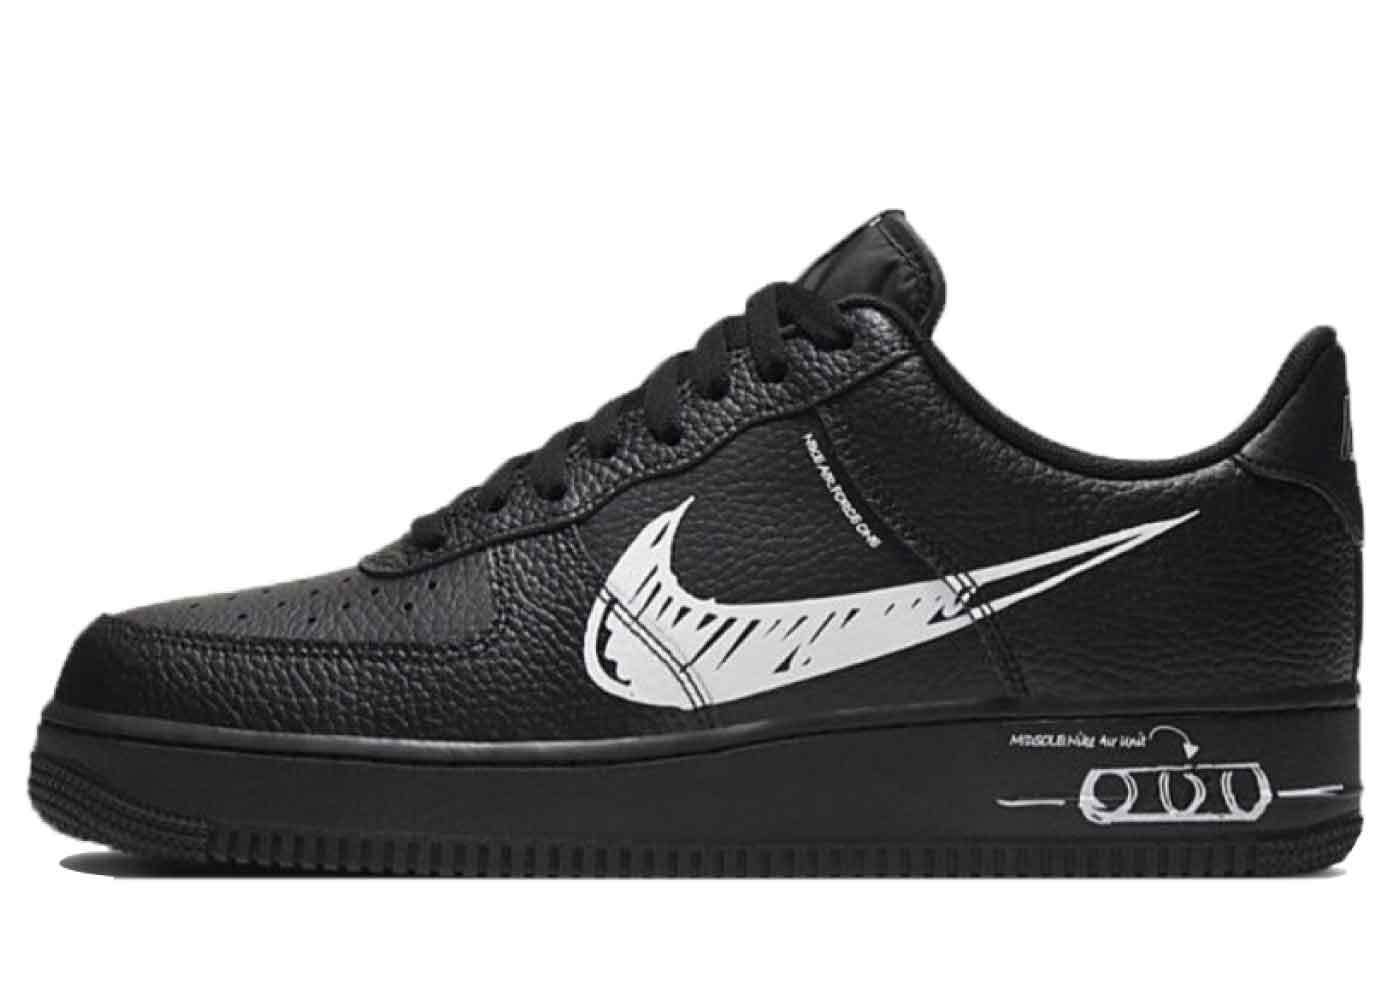 Nike Air Force 1 Low Utility Sketch